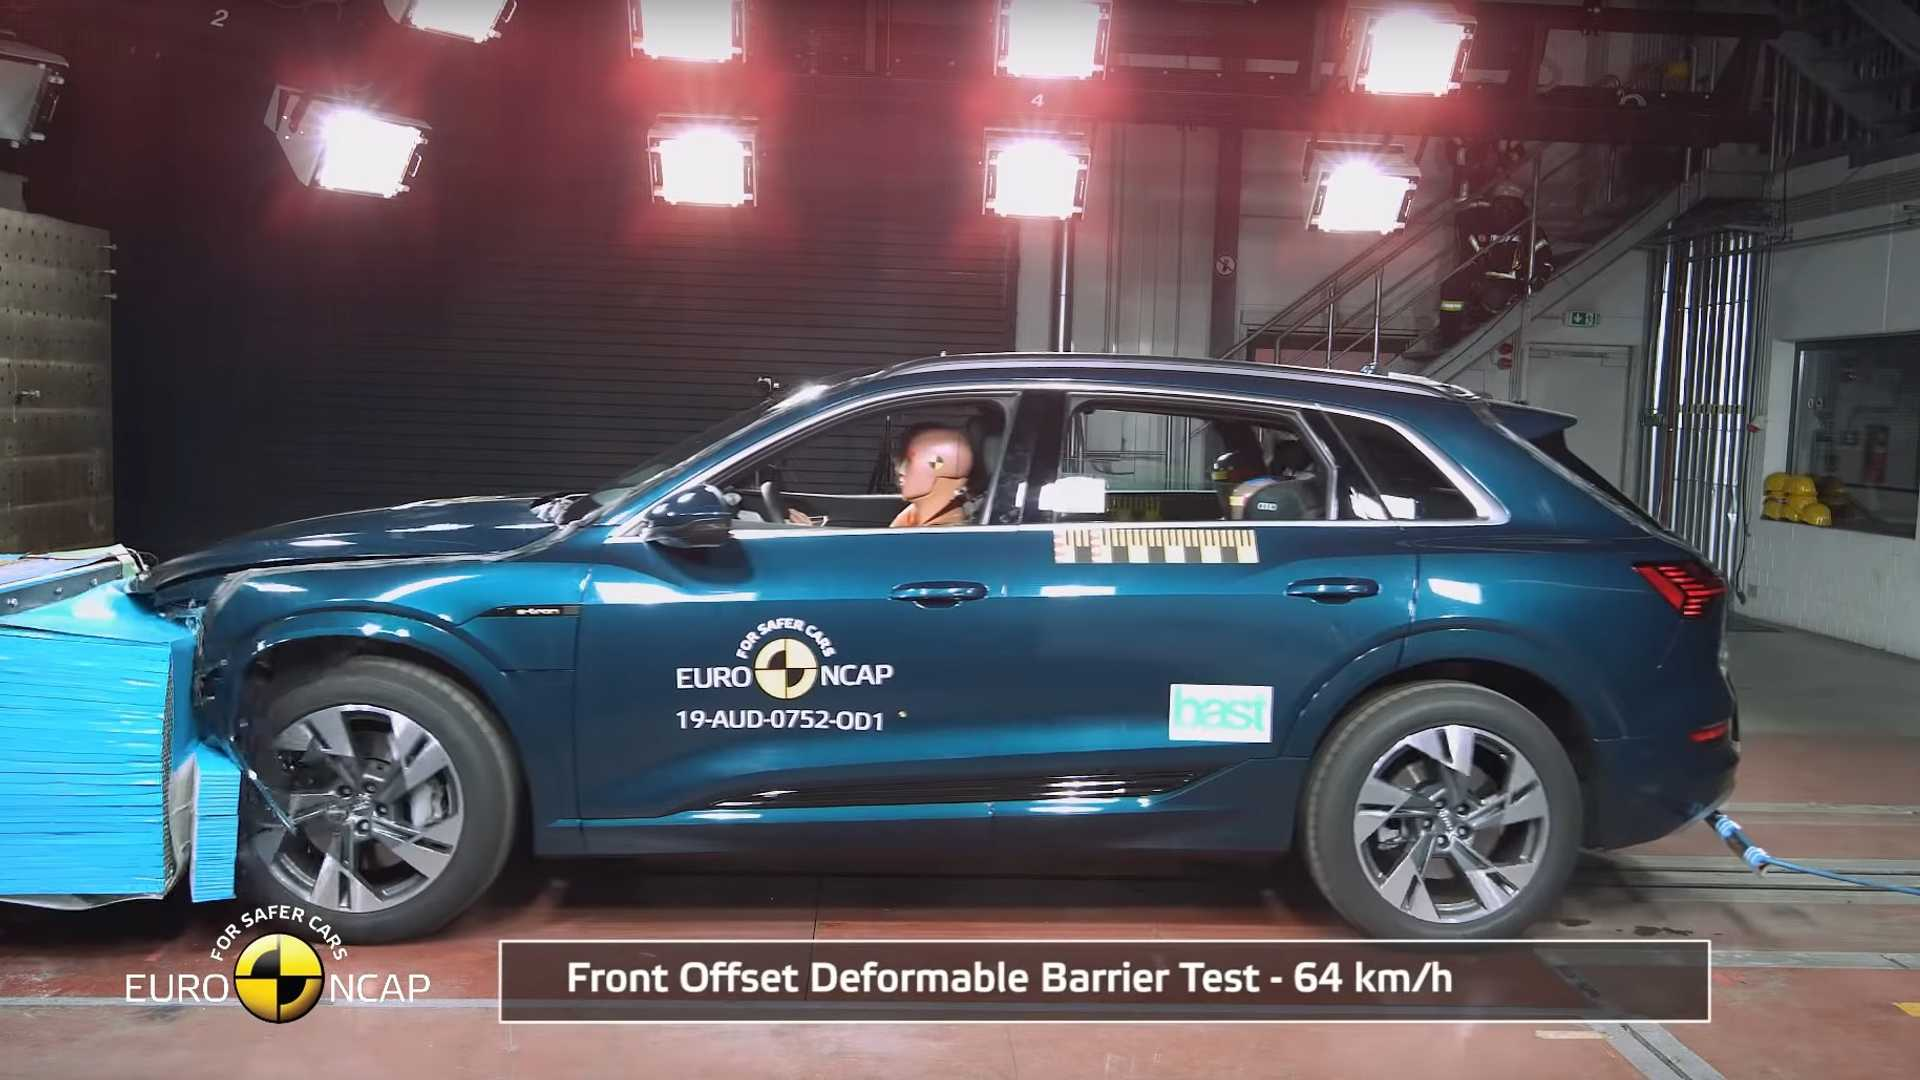 Video: Audi E-tron Gets 5 Stars In Euro NCAP Crash Tests